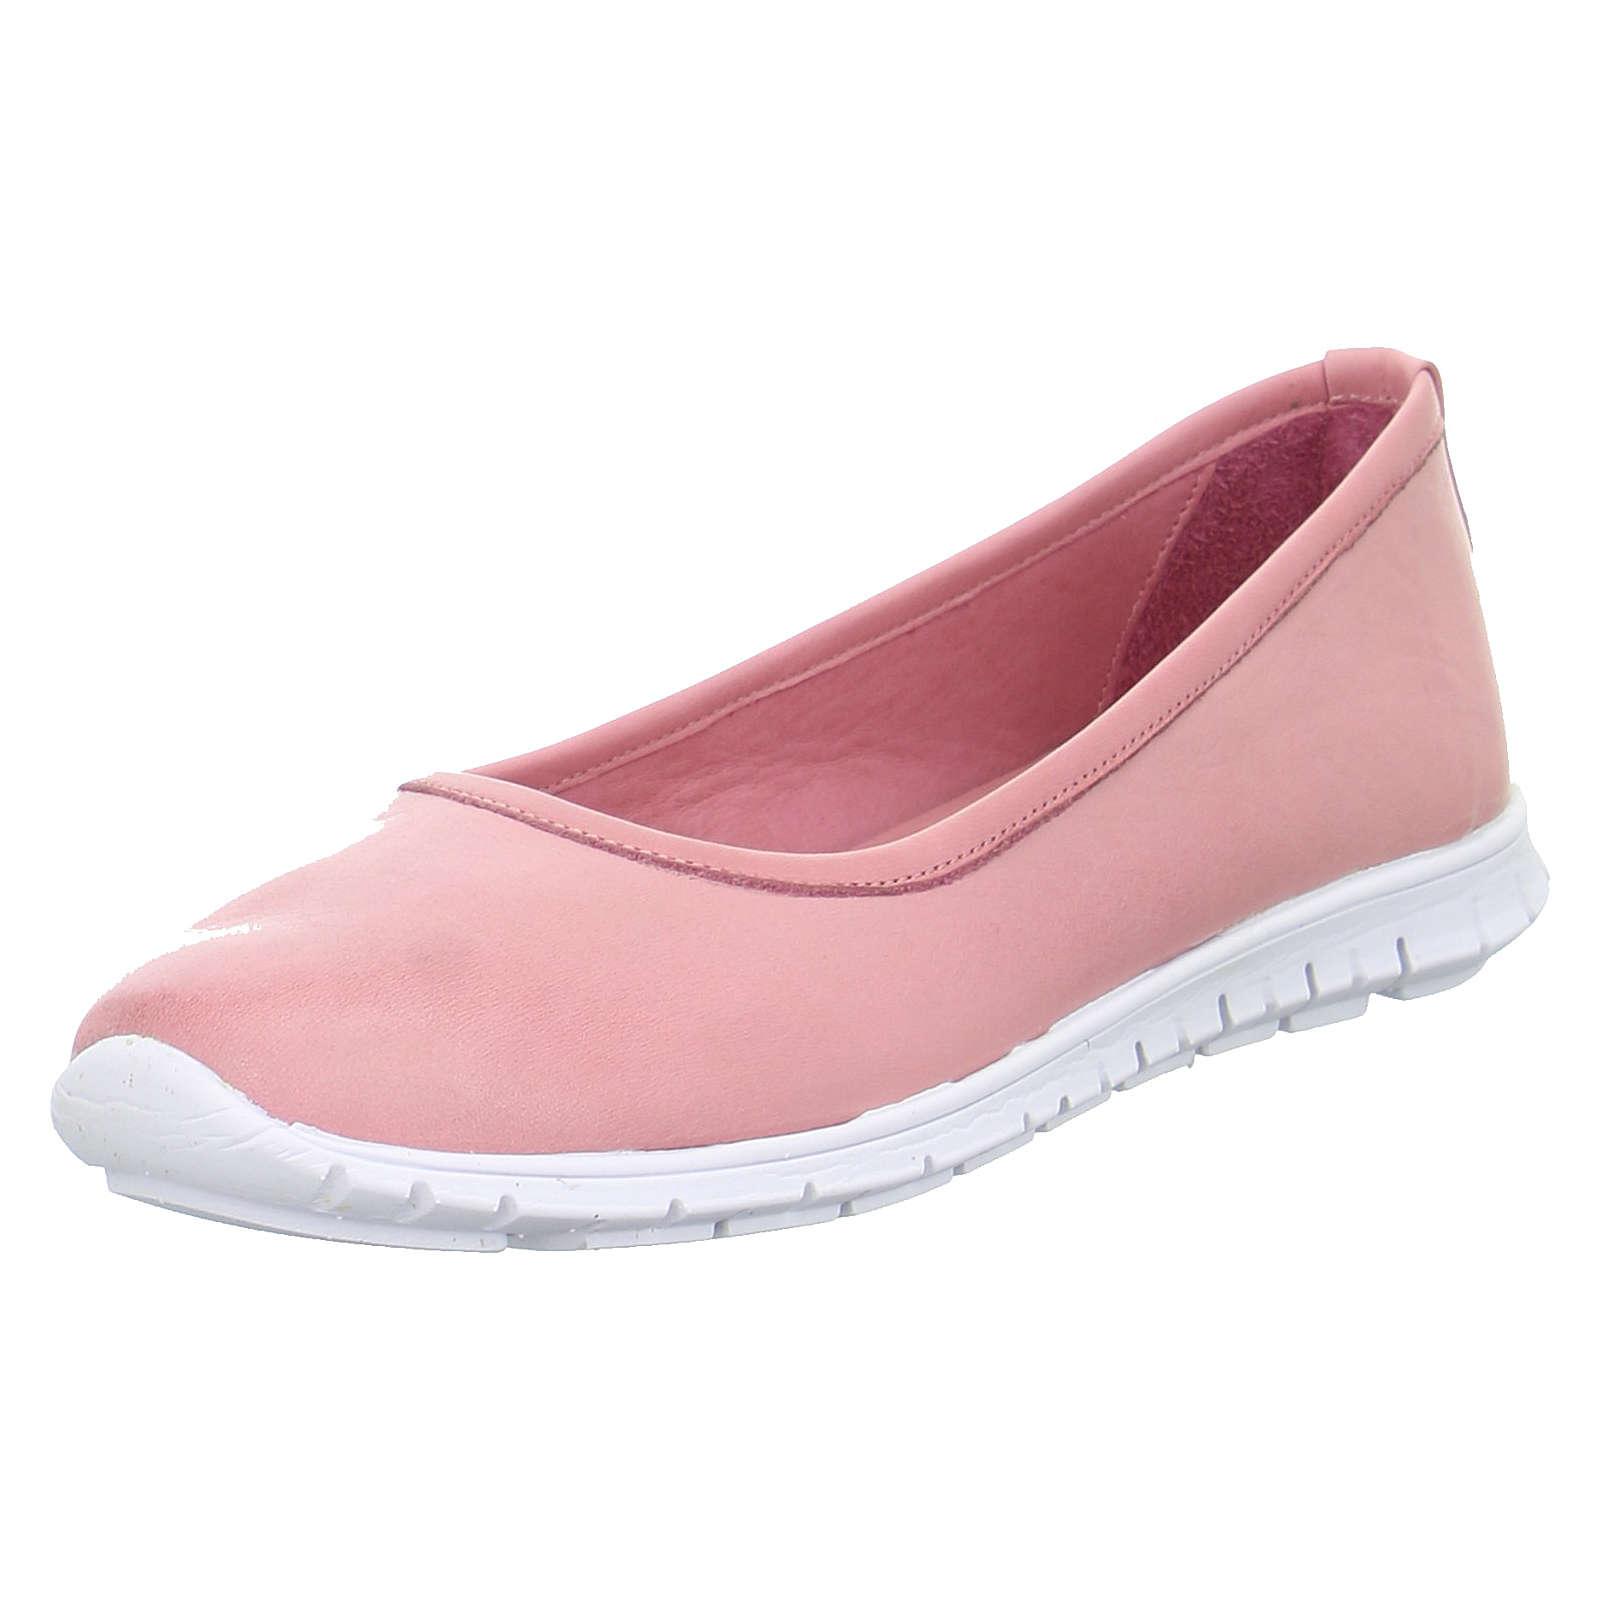 Andrea Conti Ballerinas 0027962 Klassische Slipper rosa Damen Gr. 38